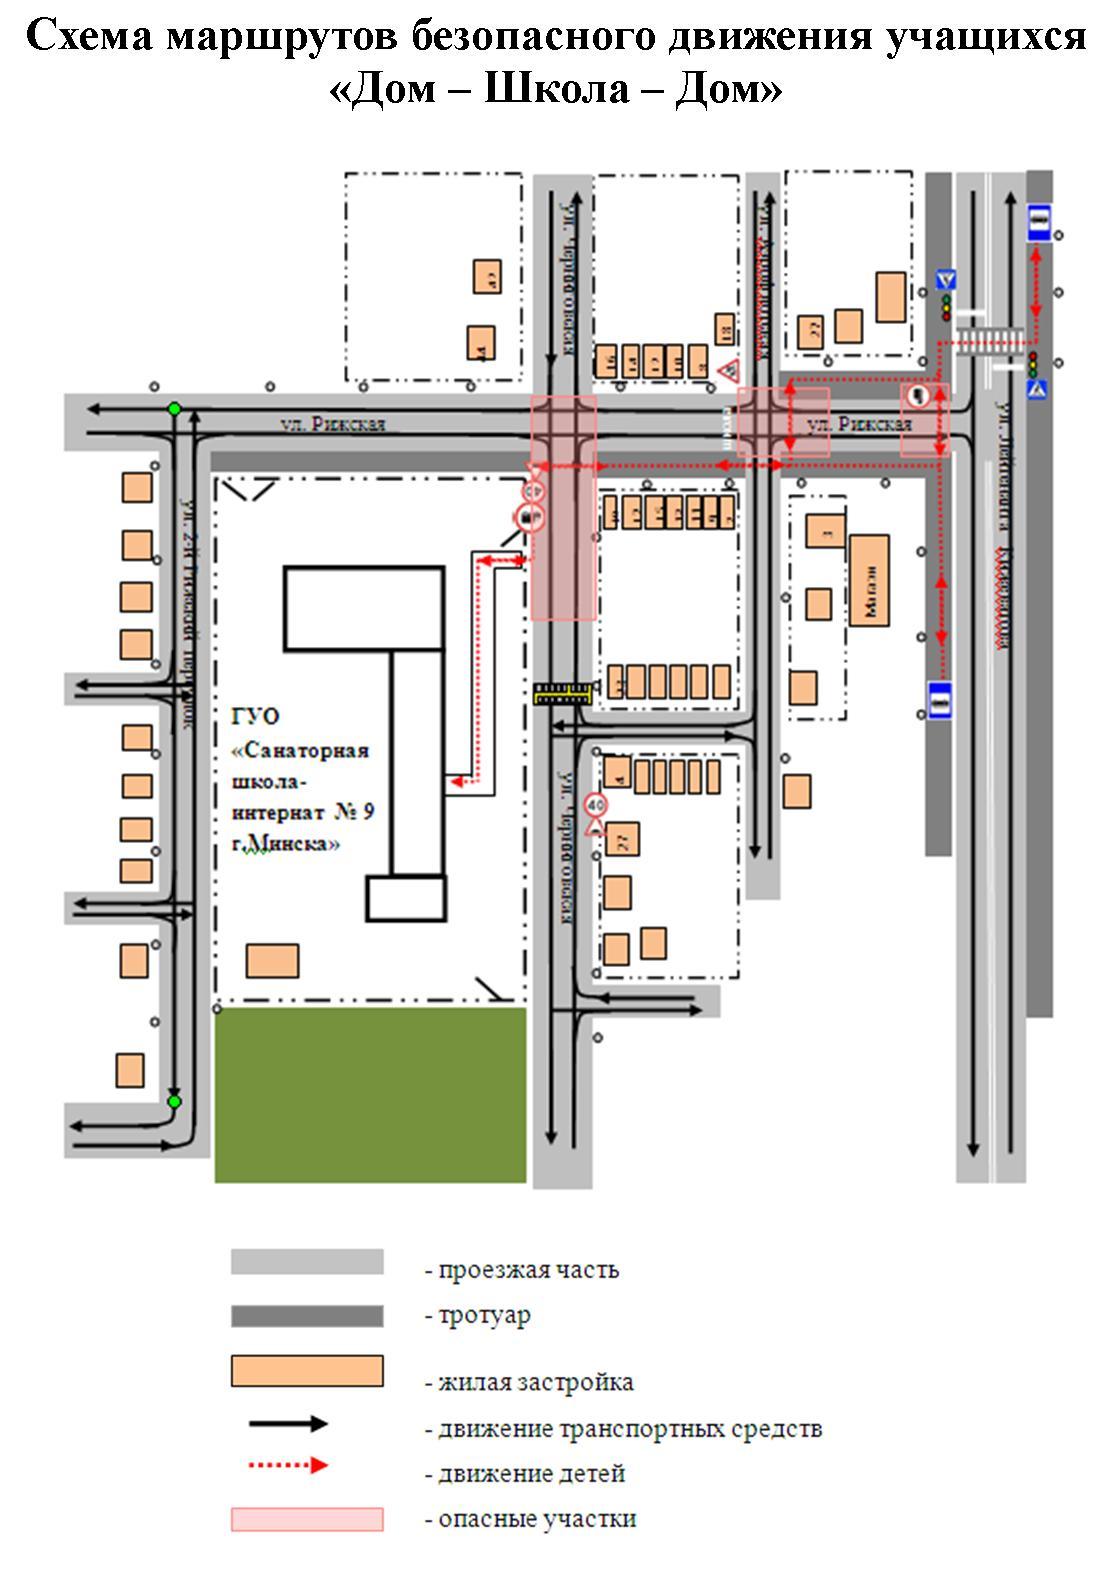 Схема безопасного движения дом-школа-дом